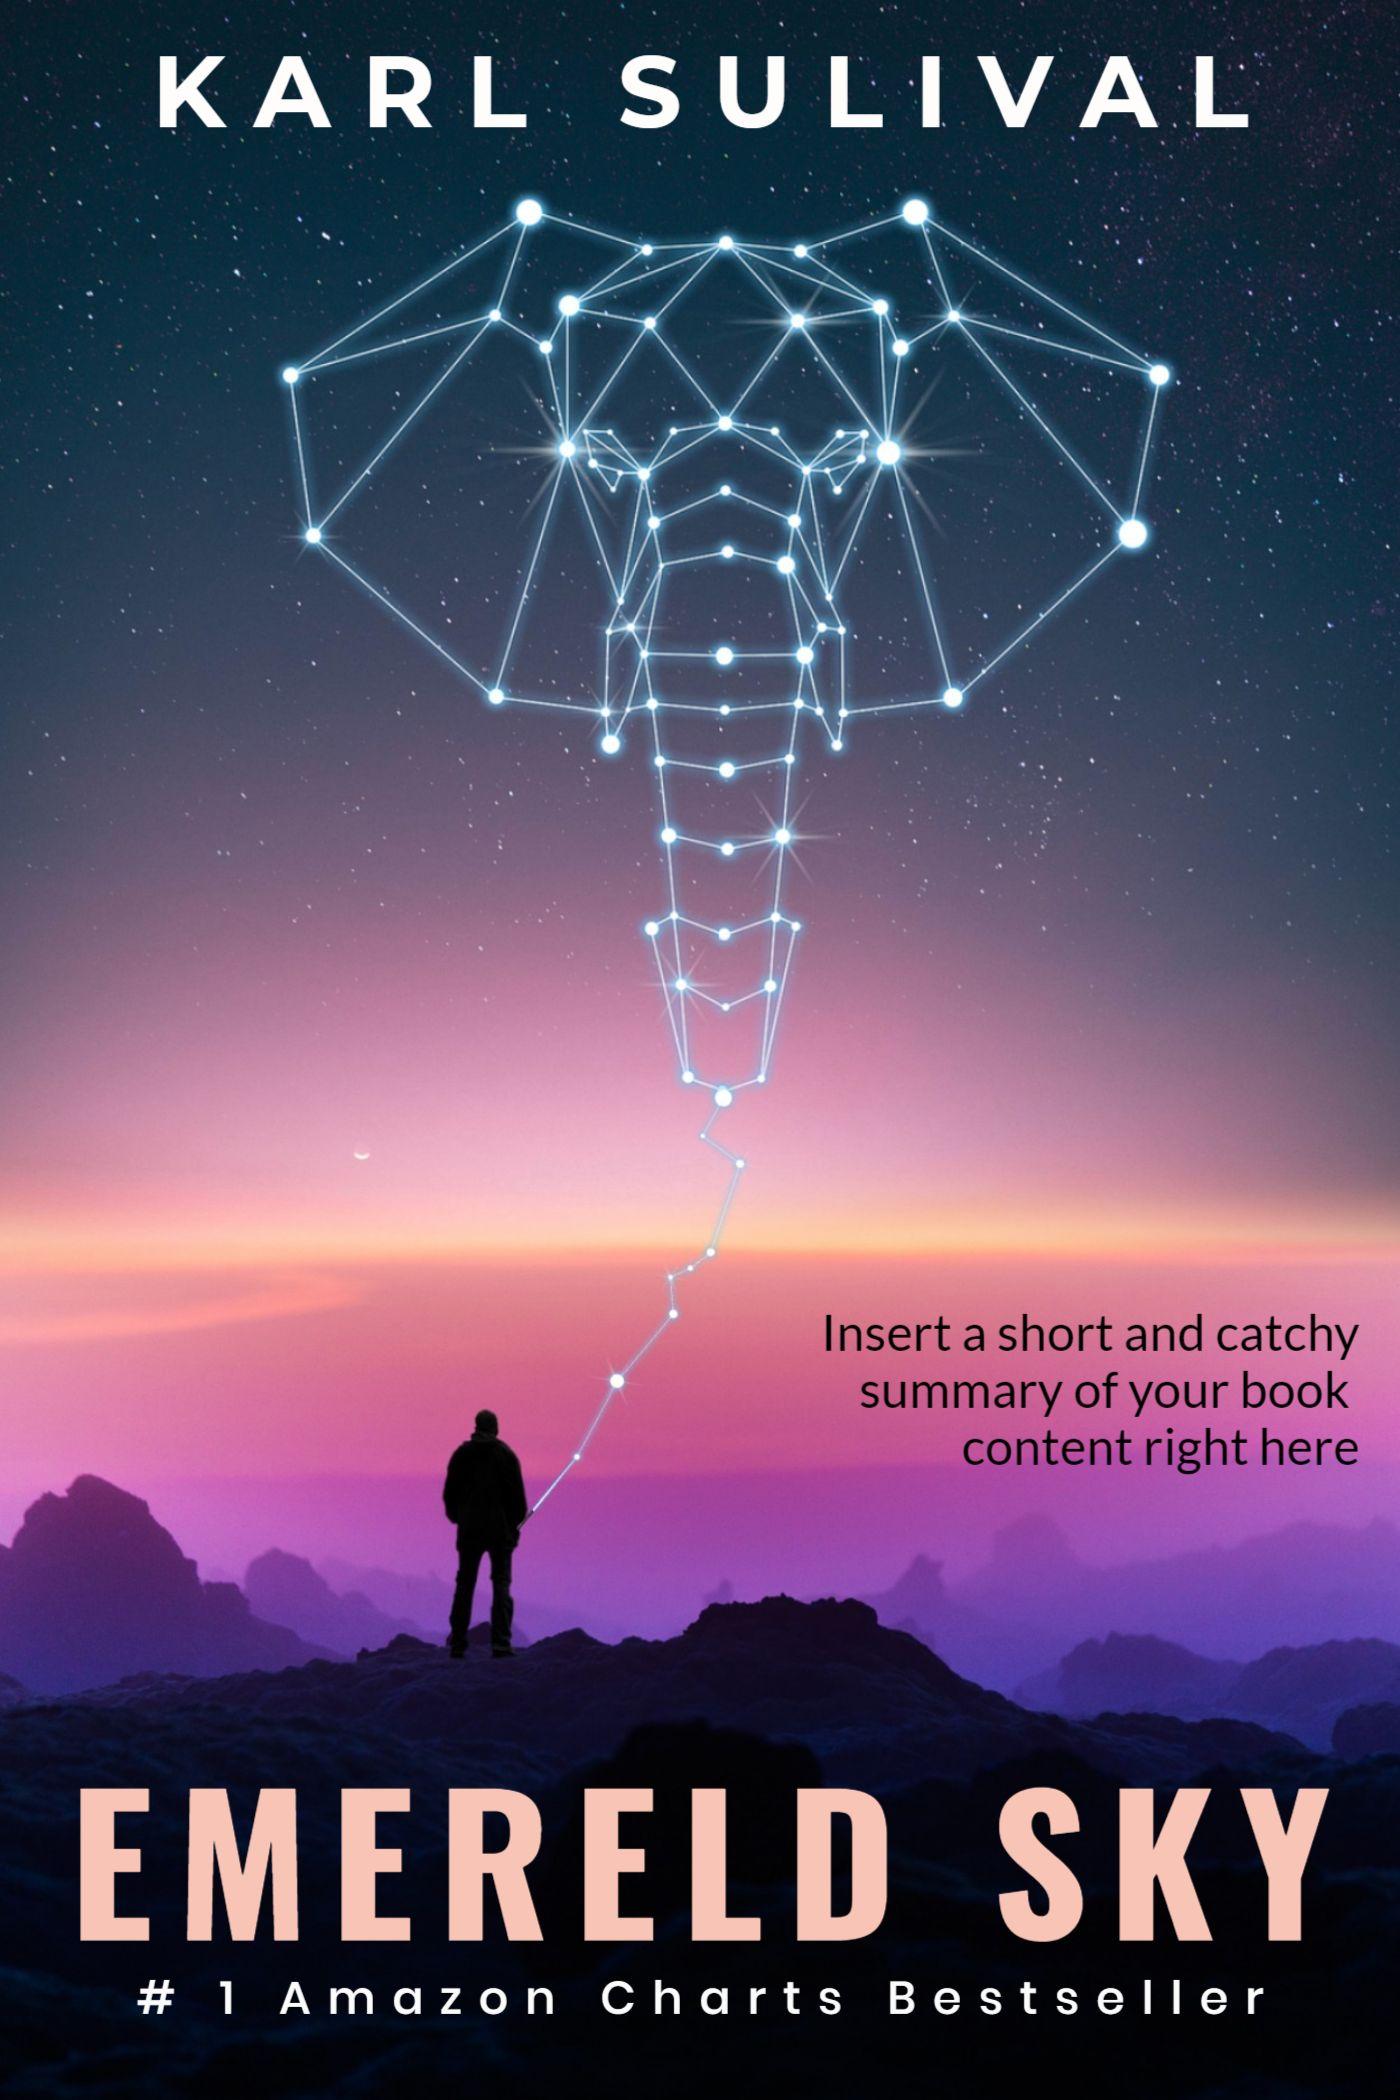 Emerald Sky Novel eBook Cover Template